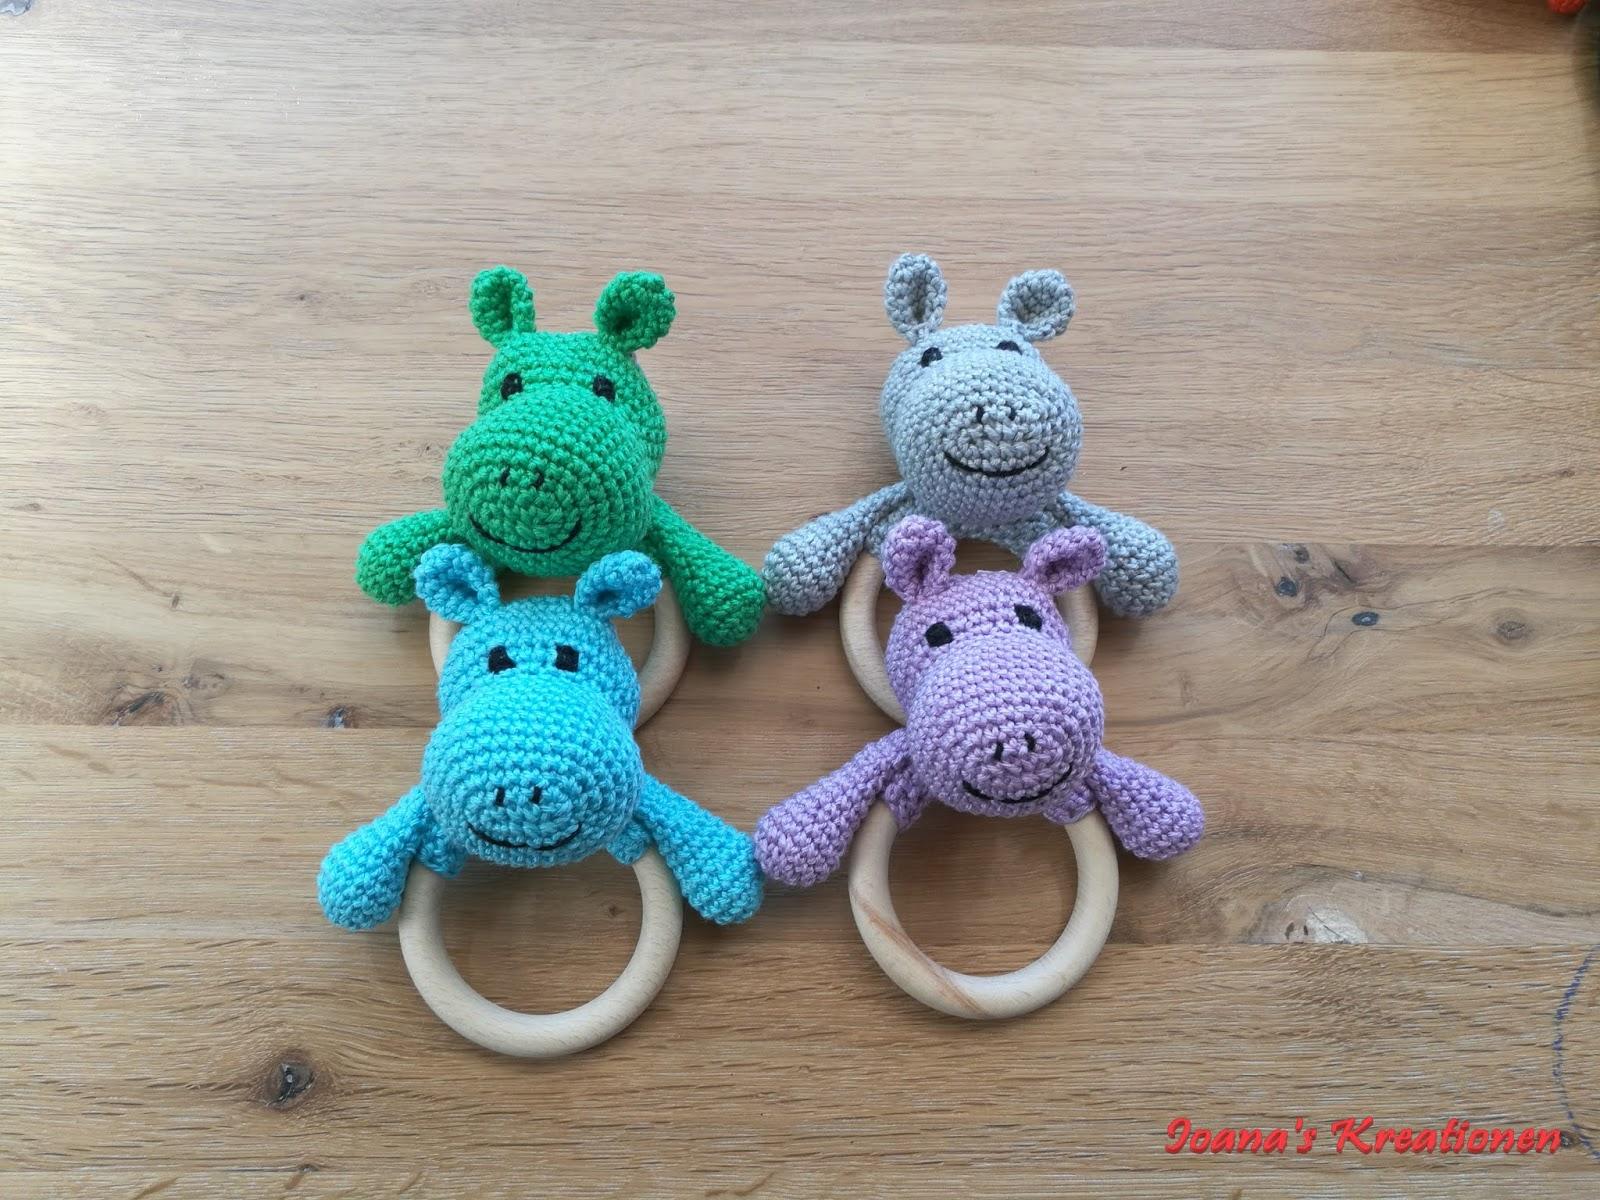 Monkey baby rattle crochet pattern | Patrones amigurumi, Muñecos ... | 1200x1600